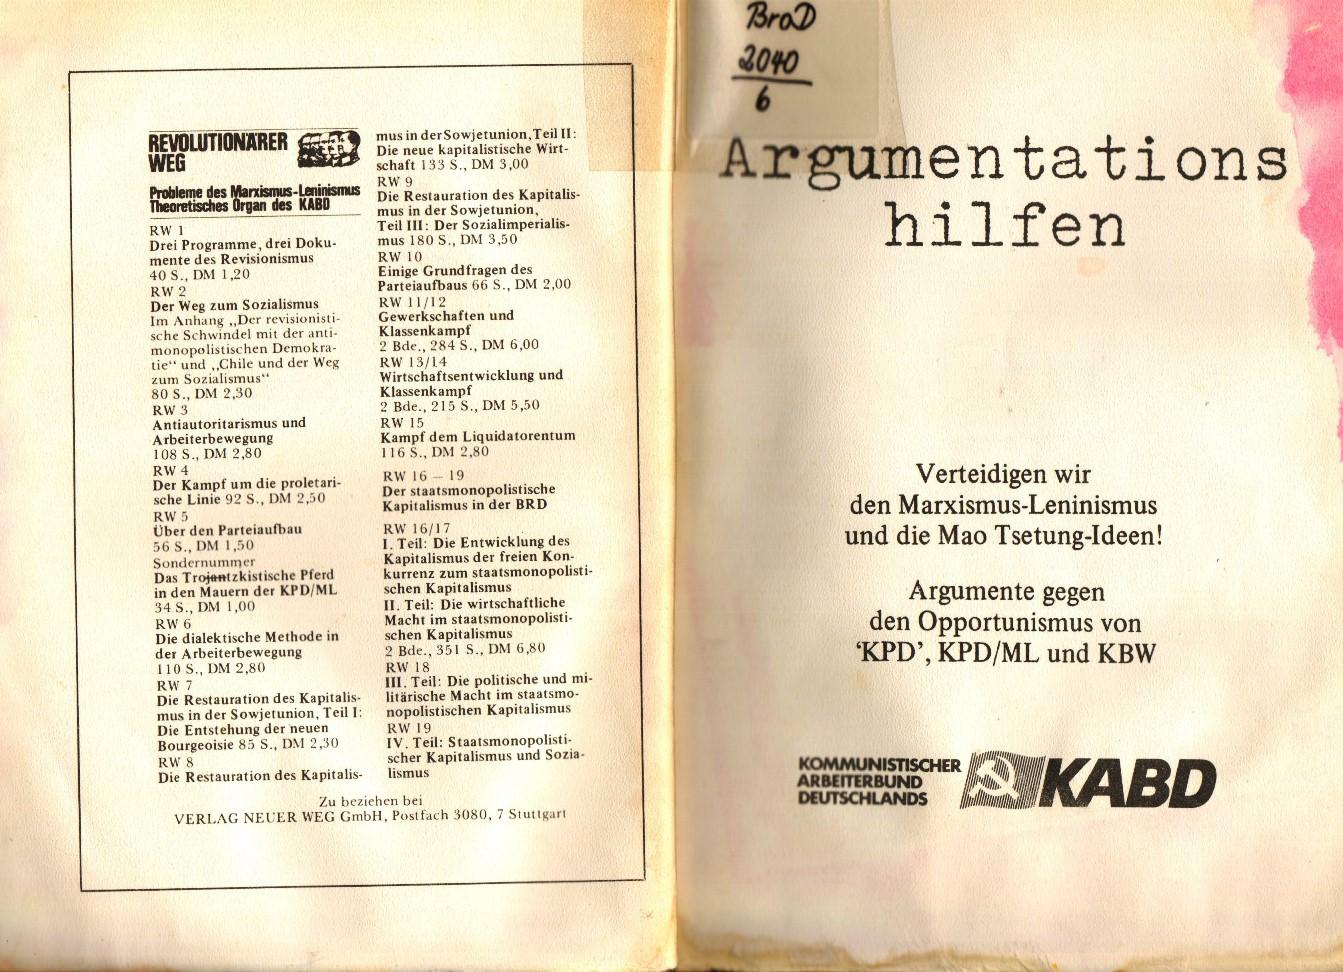 KABD_1978_Argumentationshilfen_01